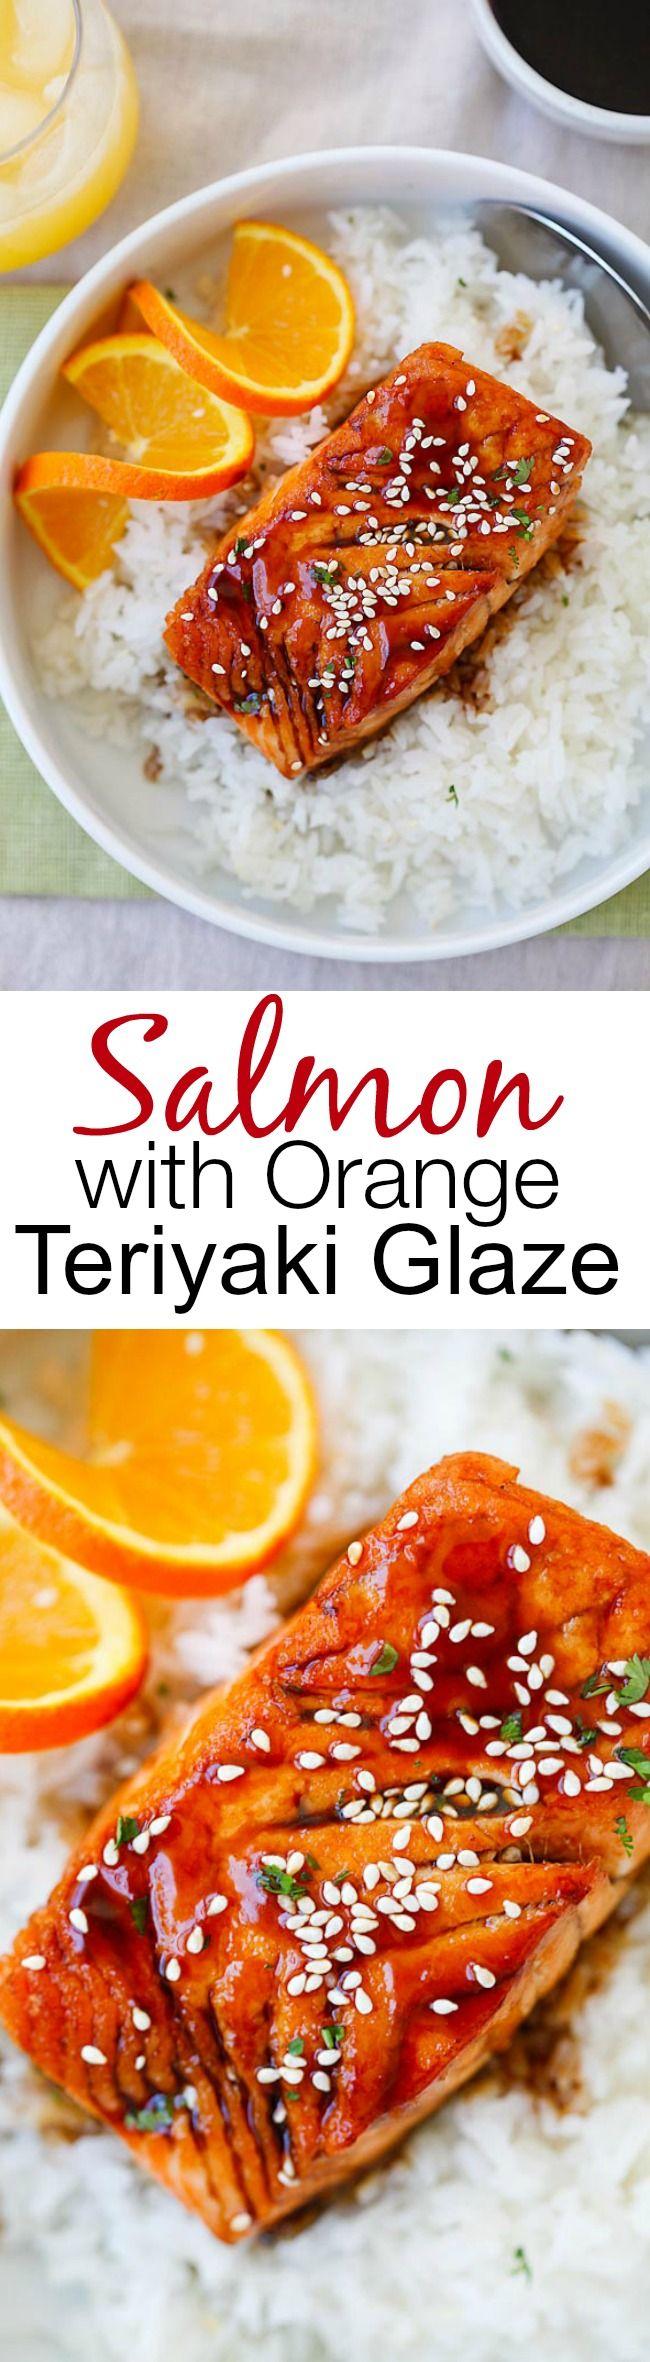 Salmon with Orange Teriyaki Glaze – the easiest and tastiest salmon you'll ever make. Juicy and delicious salmon with a tangy, sweet and savory orange teriyaki sauce | rasamalaysia.com #salmon